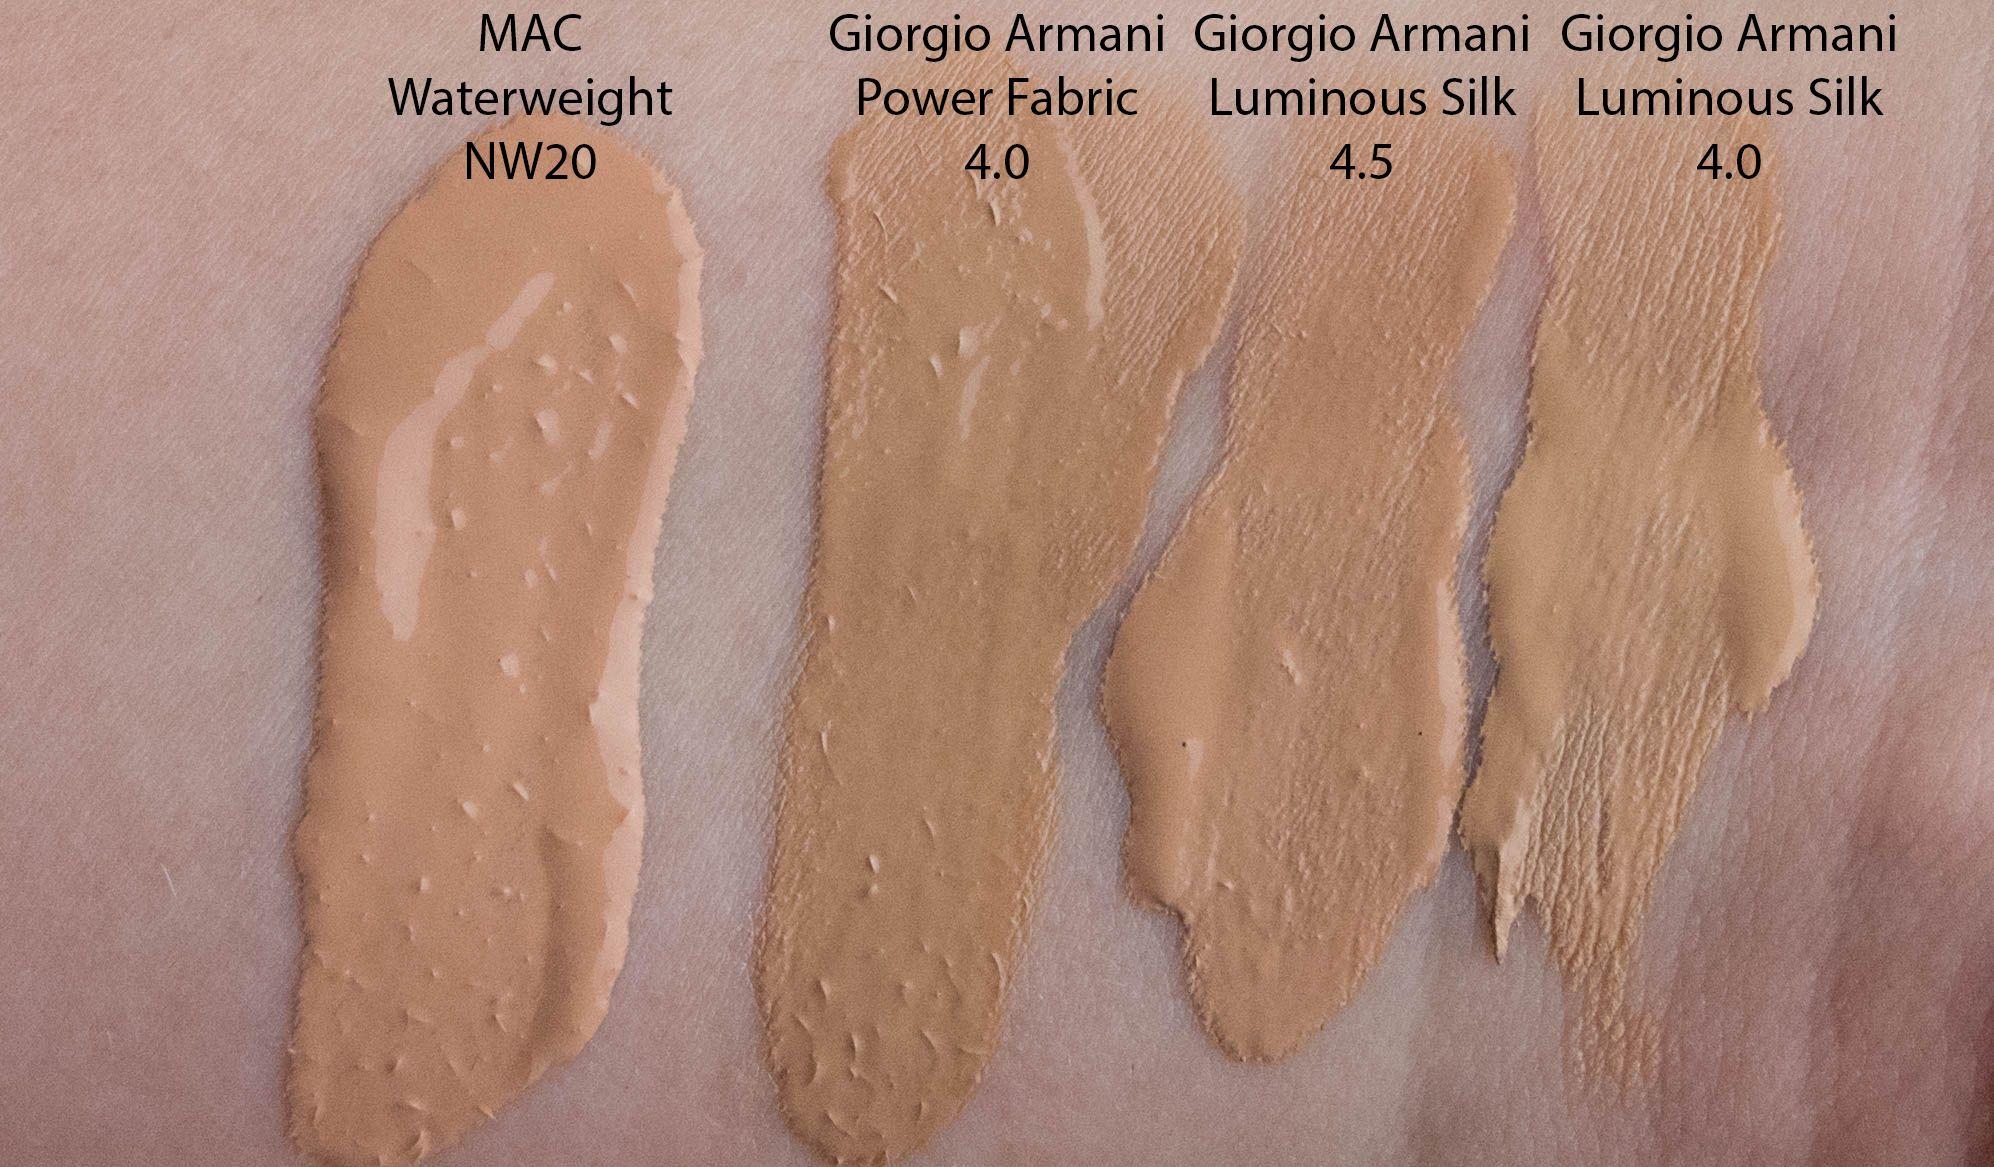 Giorgio Armani Power Fabric Foundation Swatches Cosmeticos